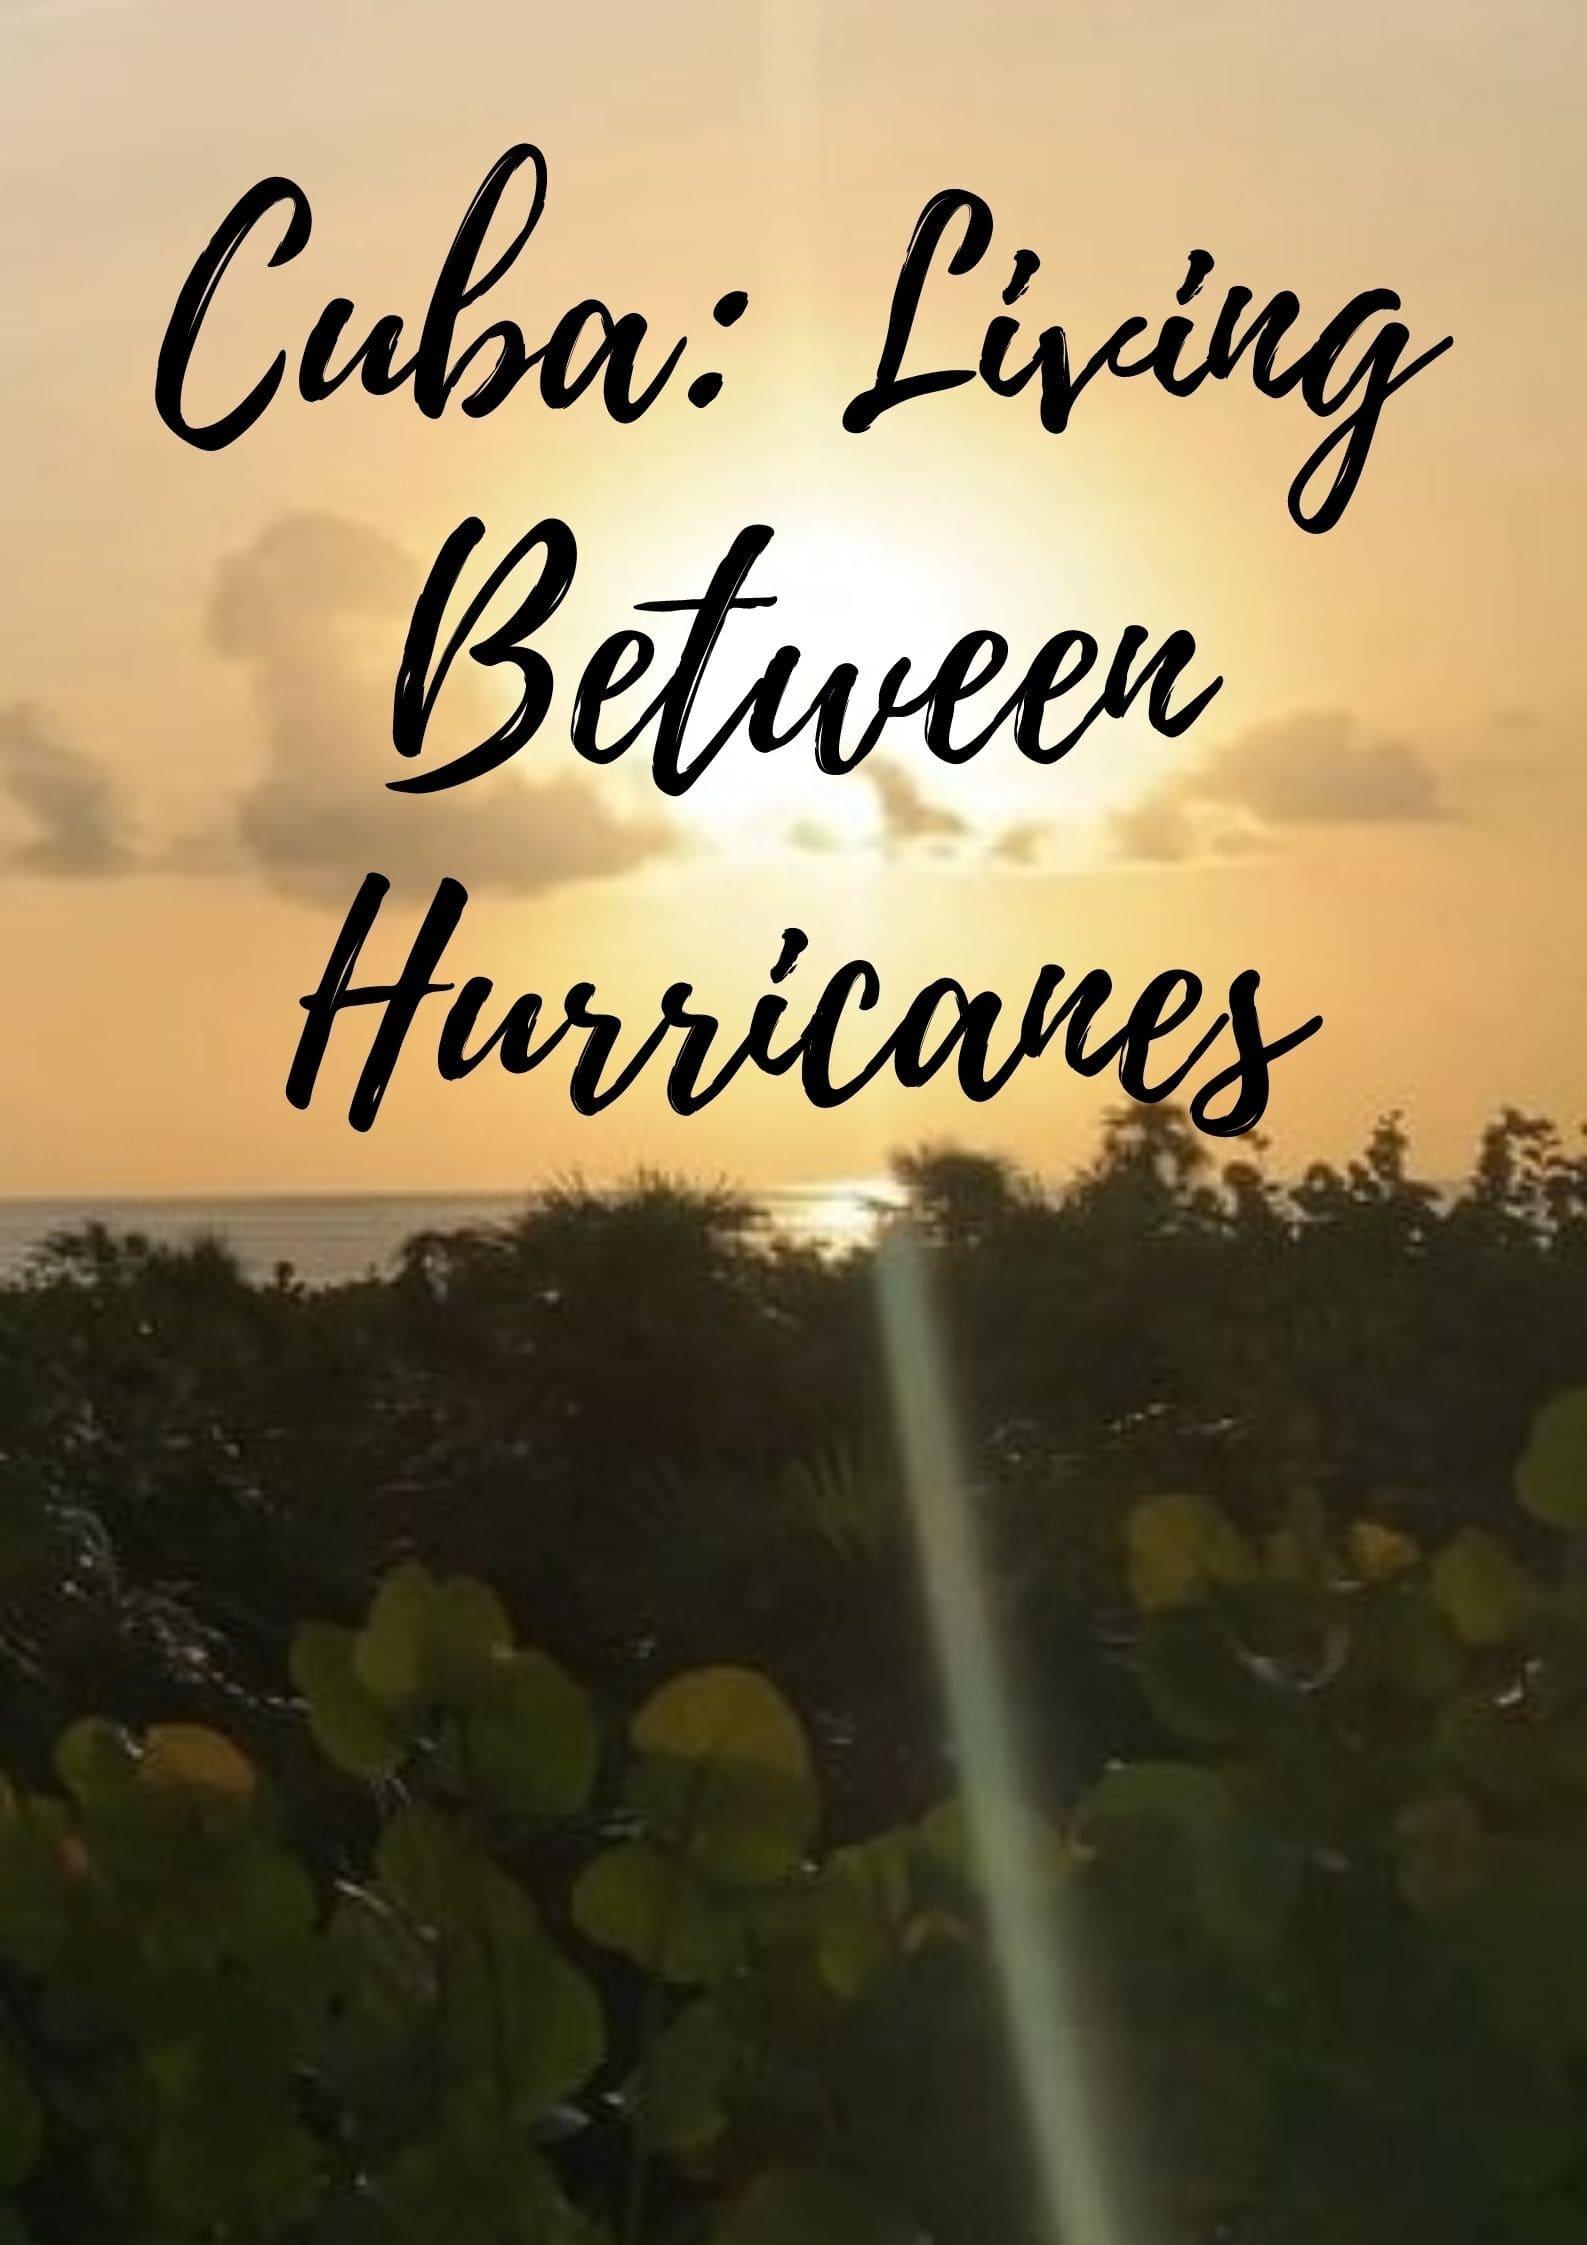 Cuba: Living Between Hurricanes